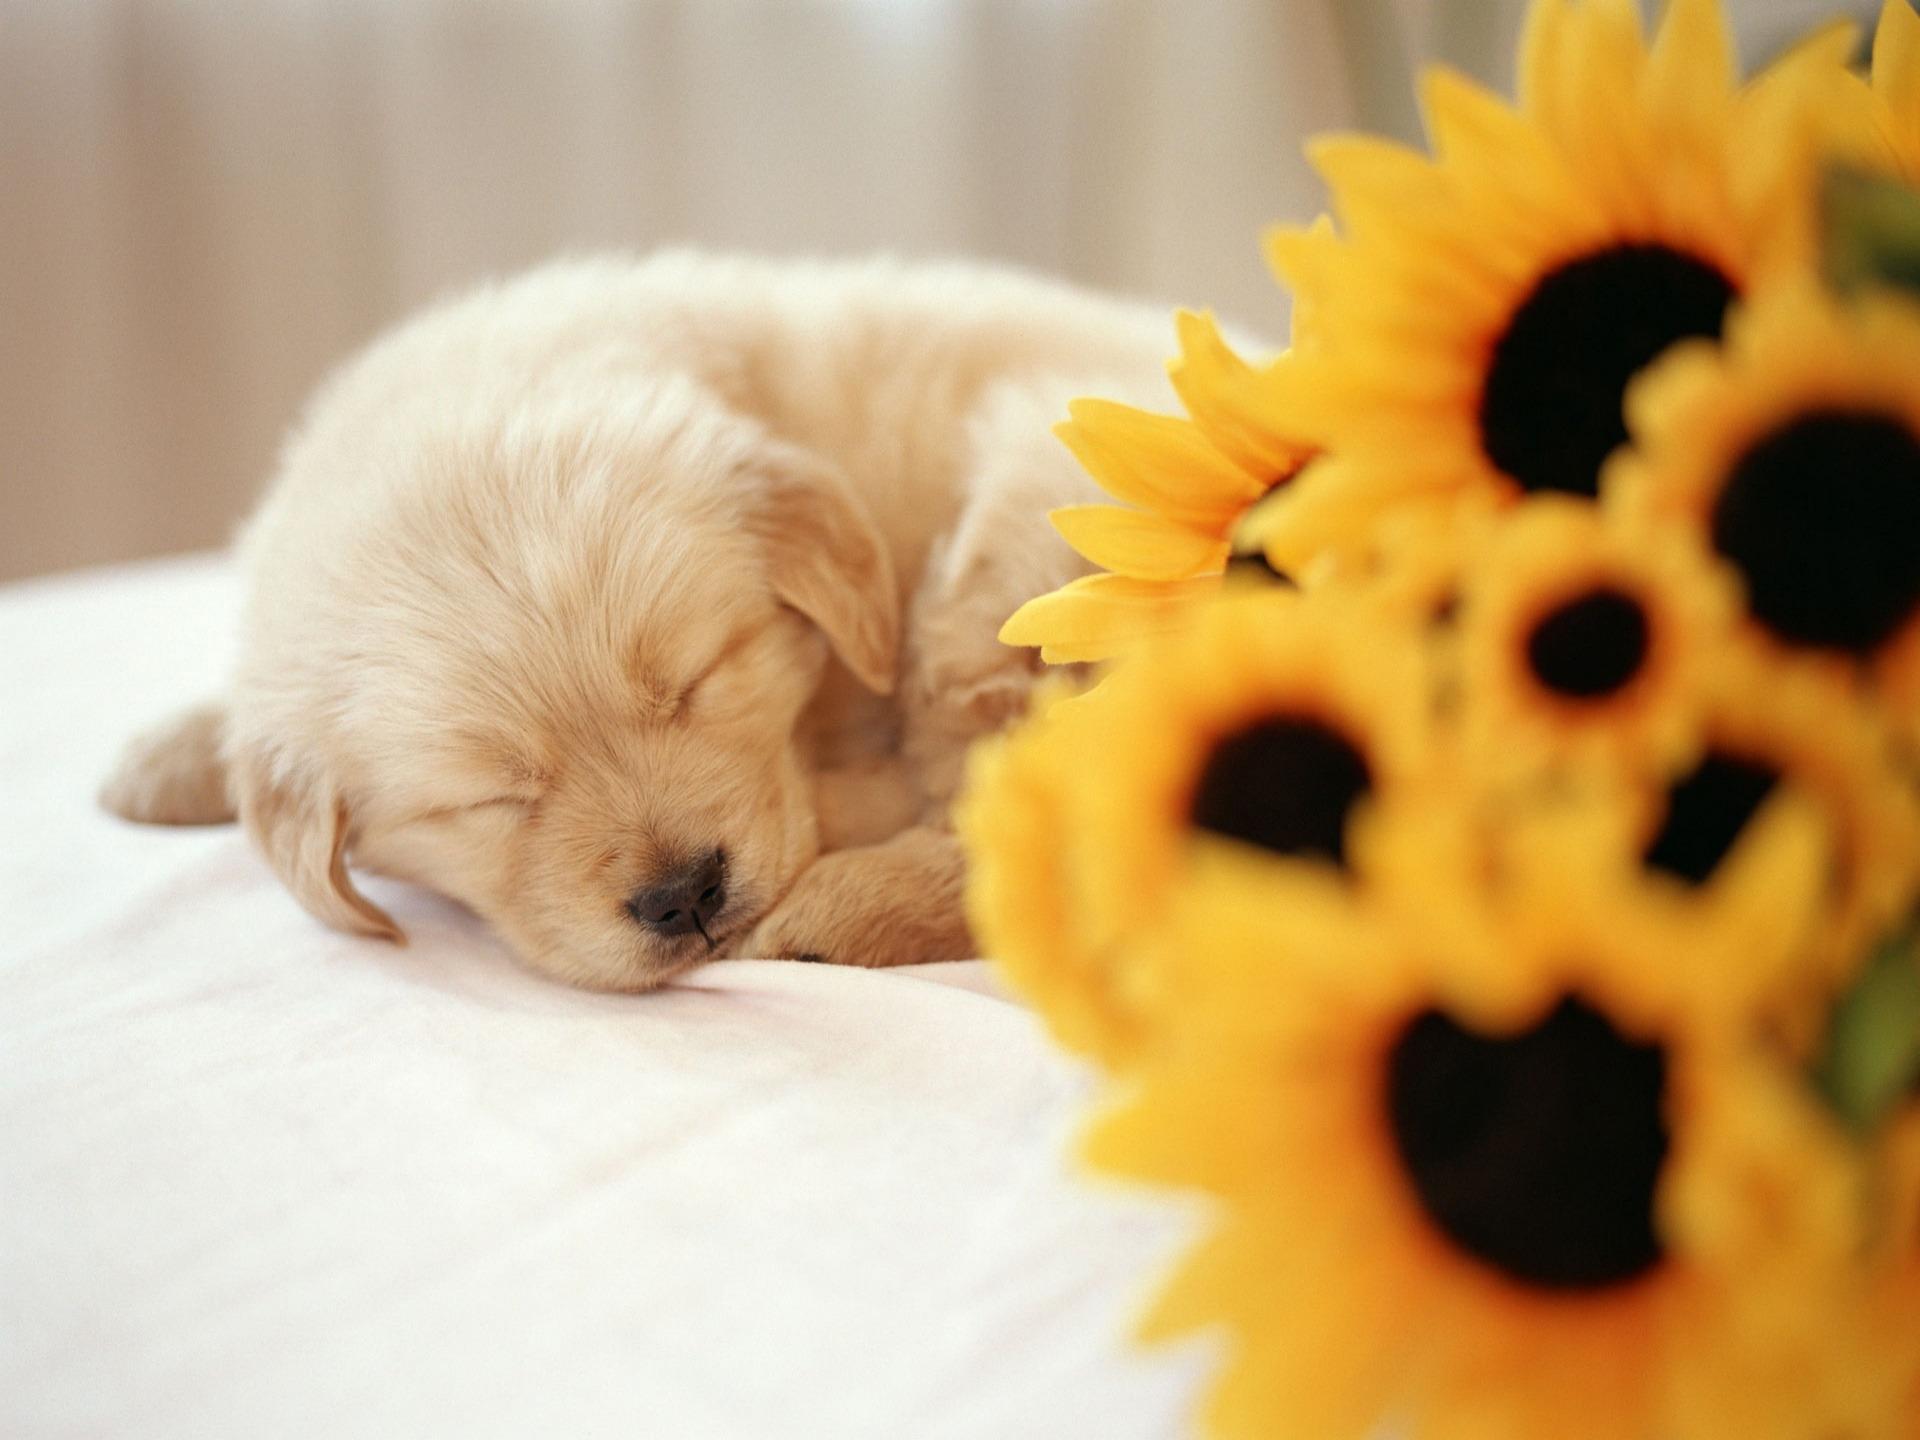 sleeping-puppy-wallpaper-dogs-animals_00429279